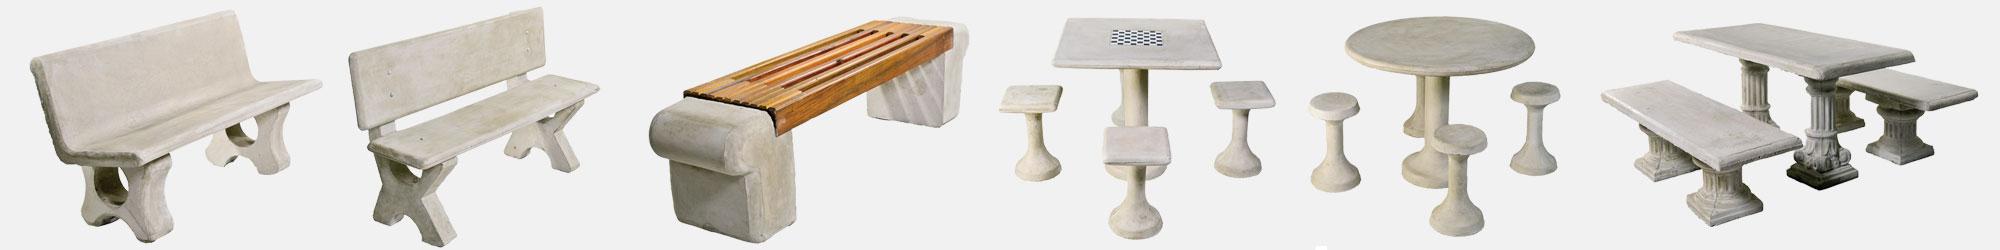 banco de jardim cimento : banco de jardim cimento:Bancos de Concreto